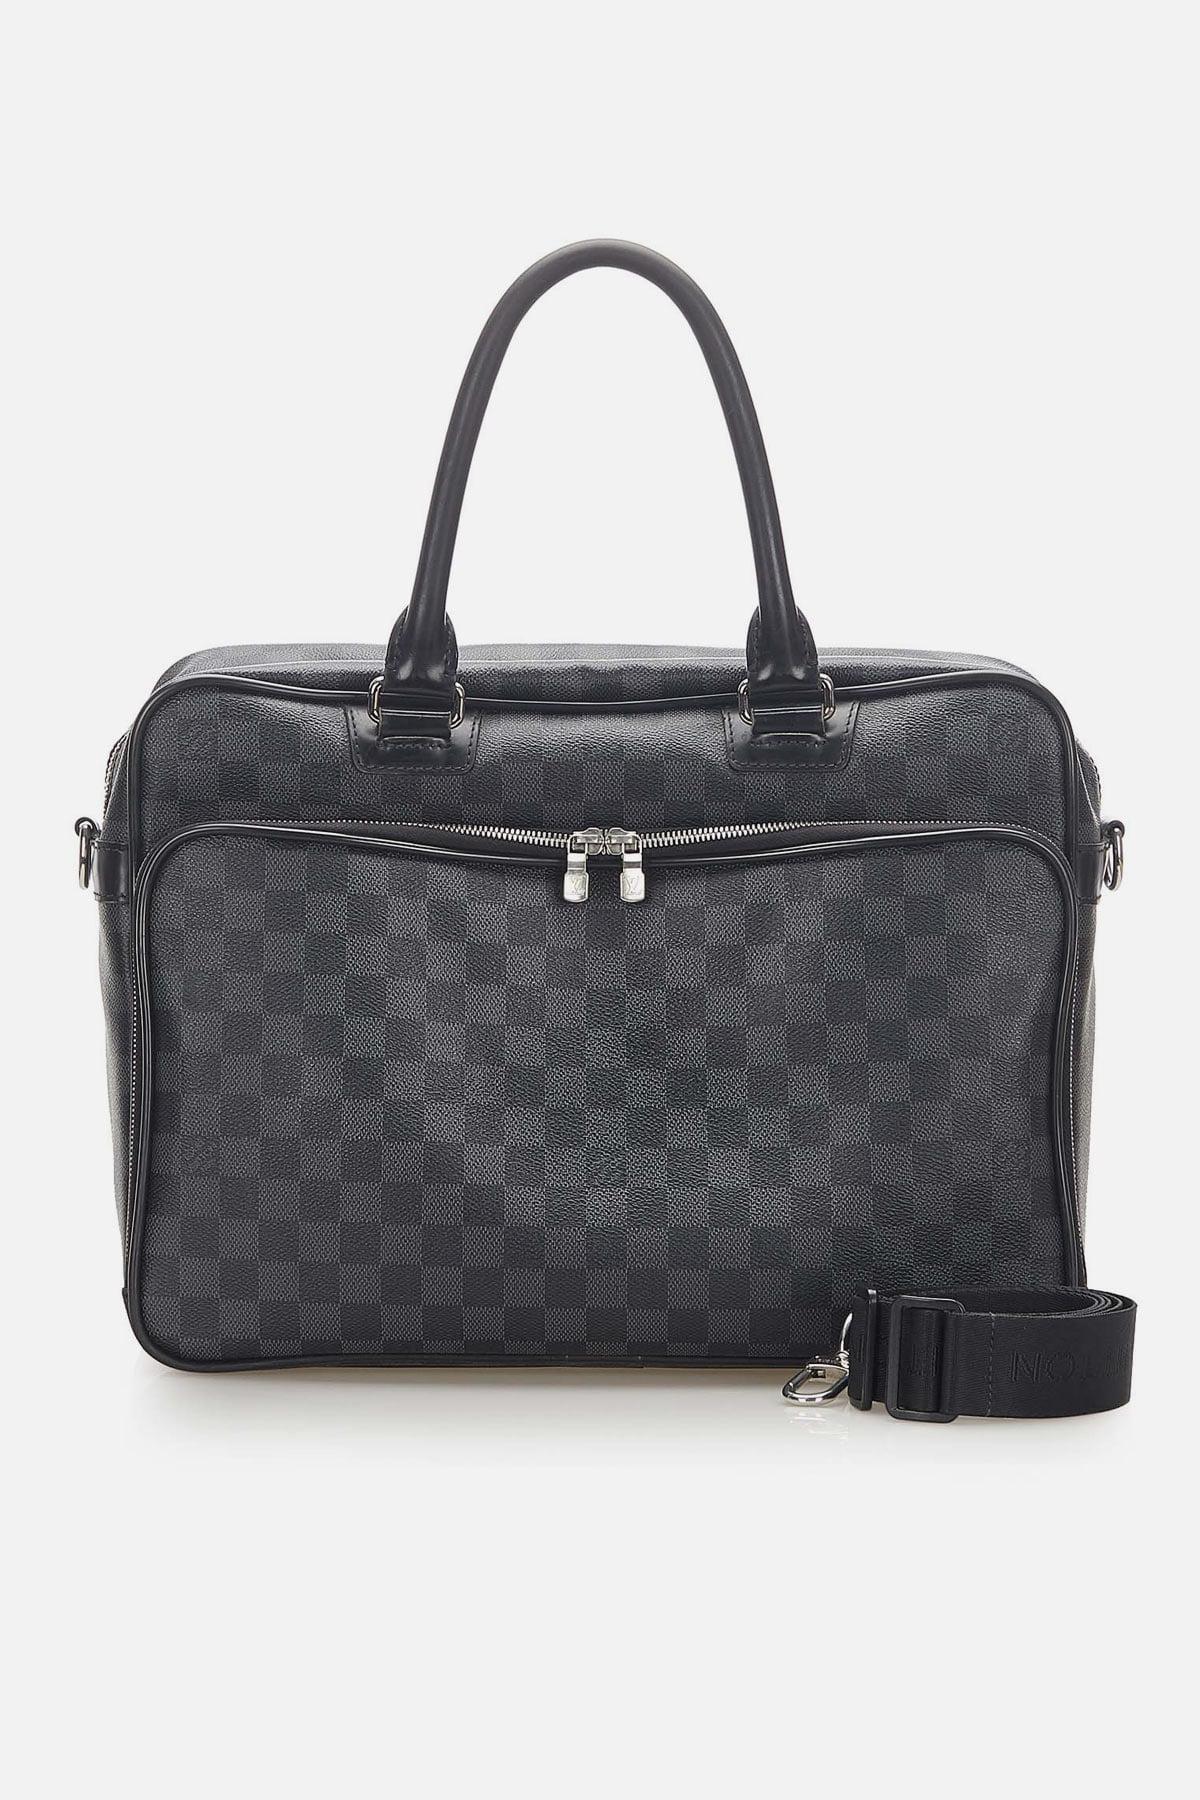 Icare Laptop Bag Damier Graphite